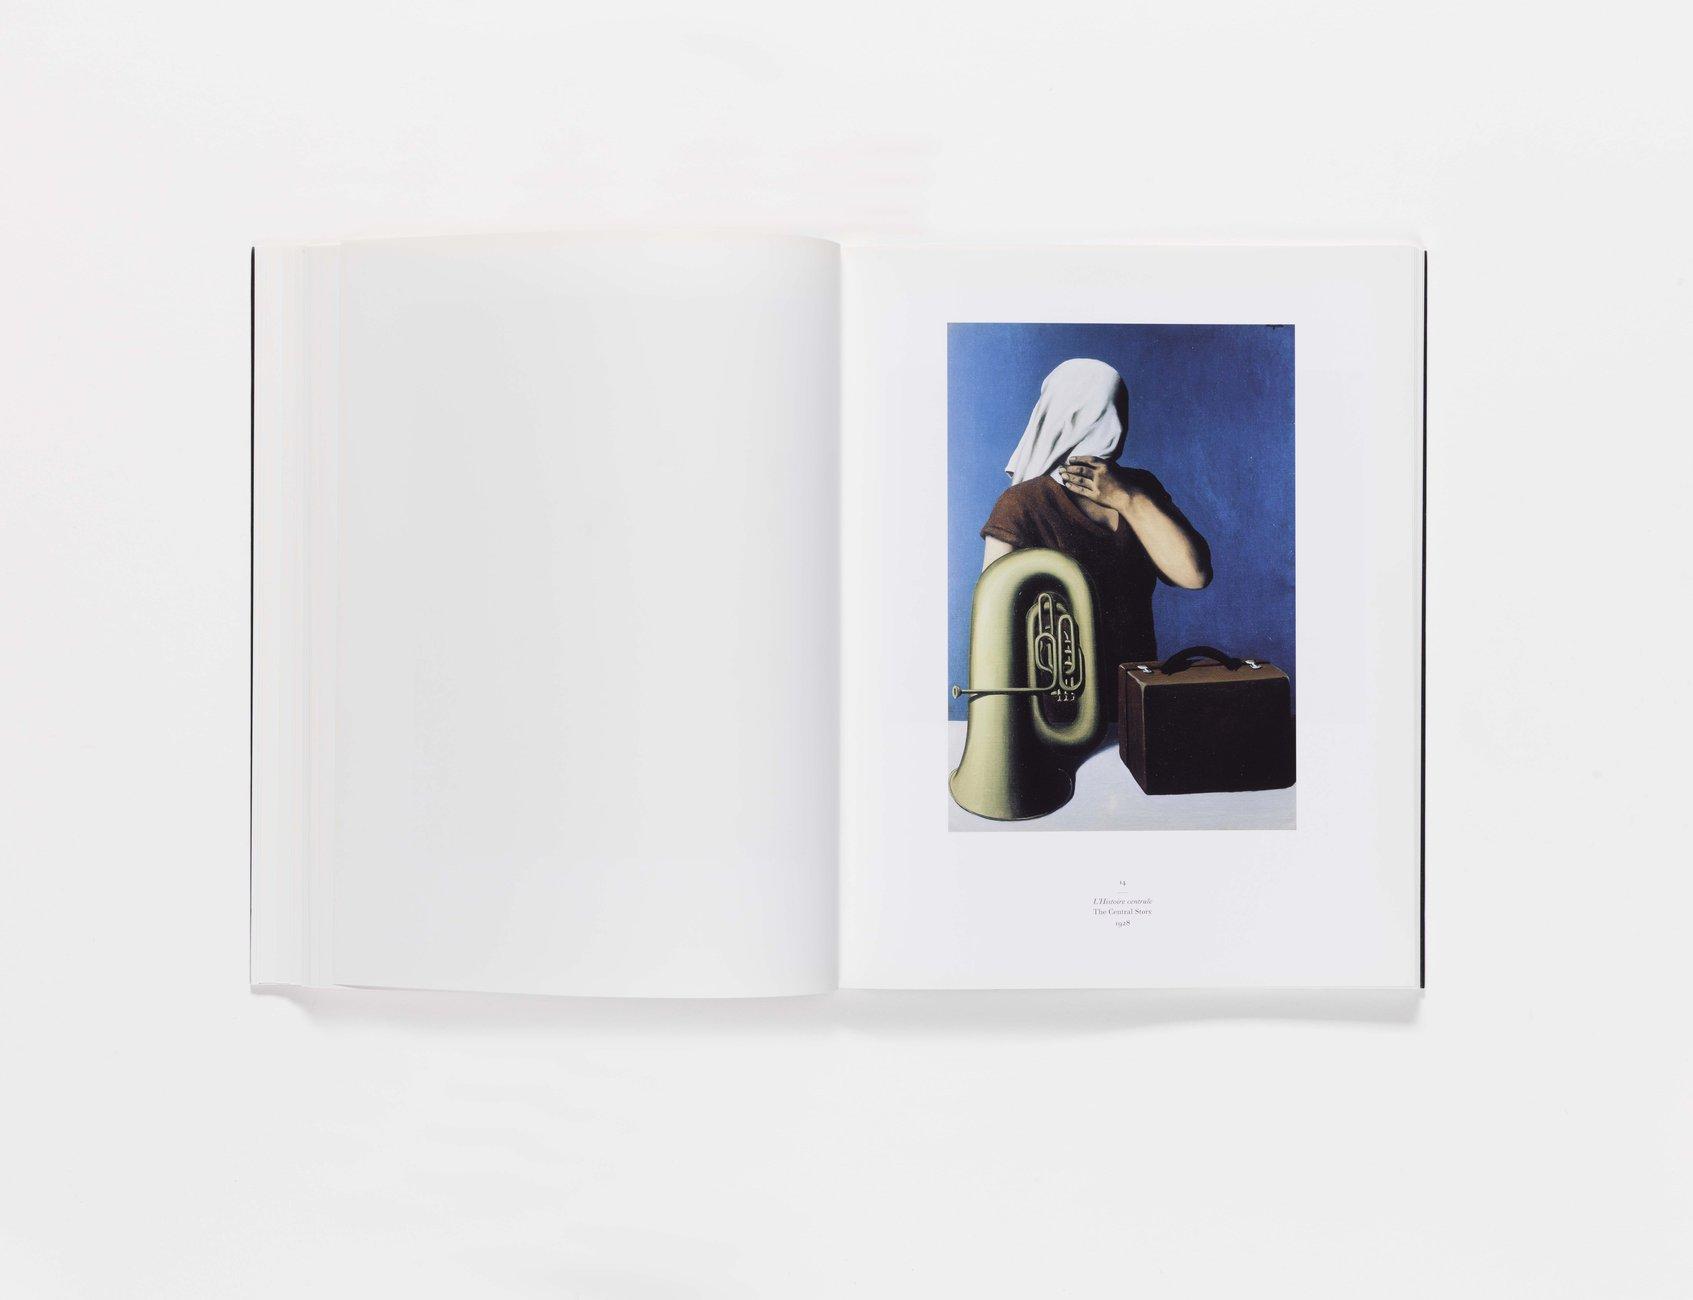 Magritte publication pages 40-41